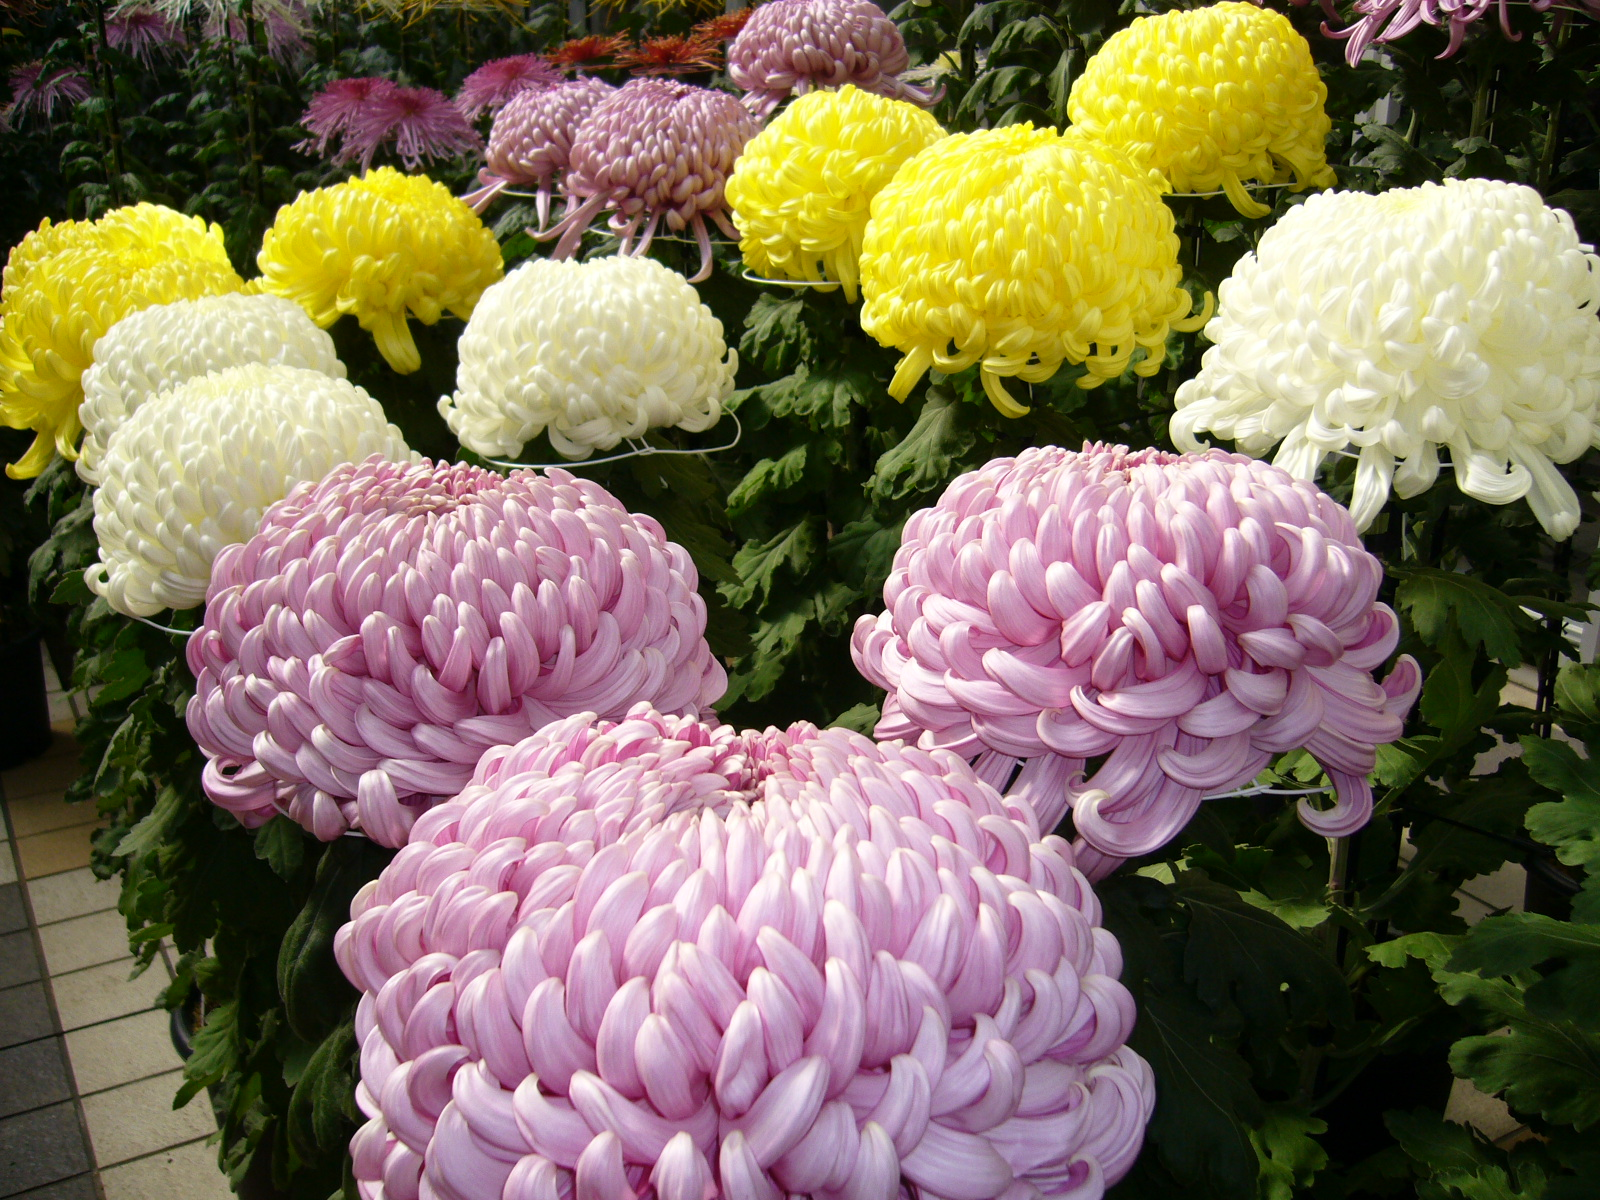 Chrysanthemum%2ckiku%2ckatori city%2cjapan